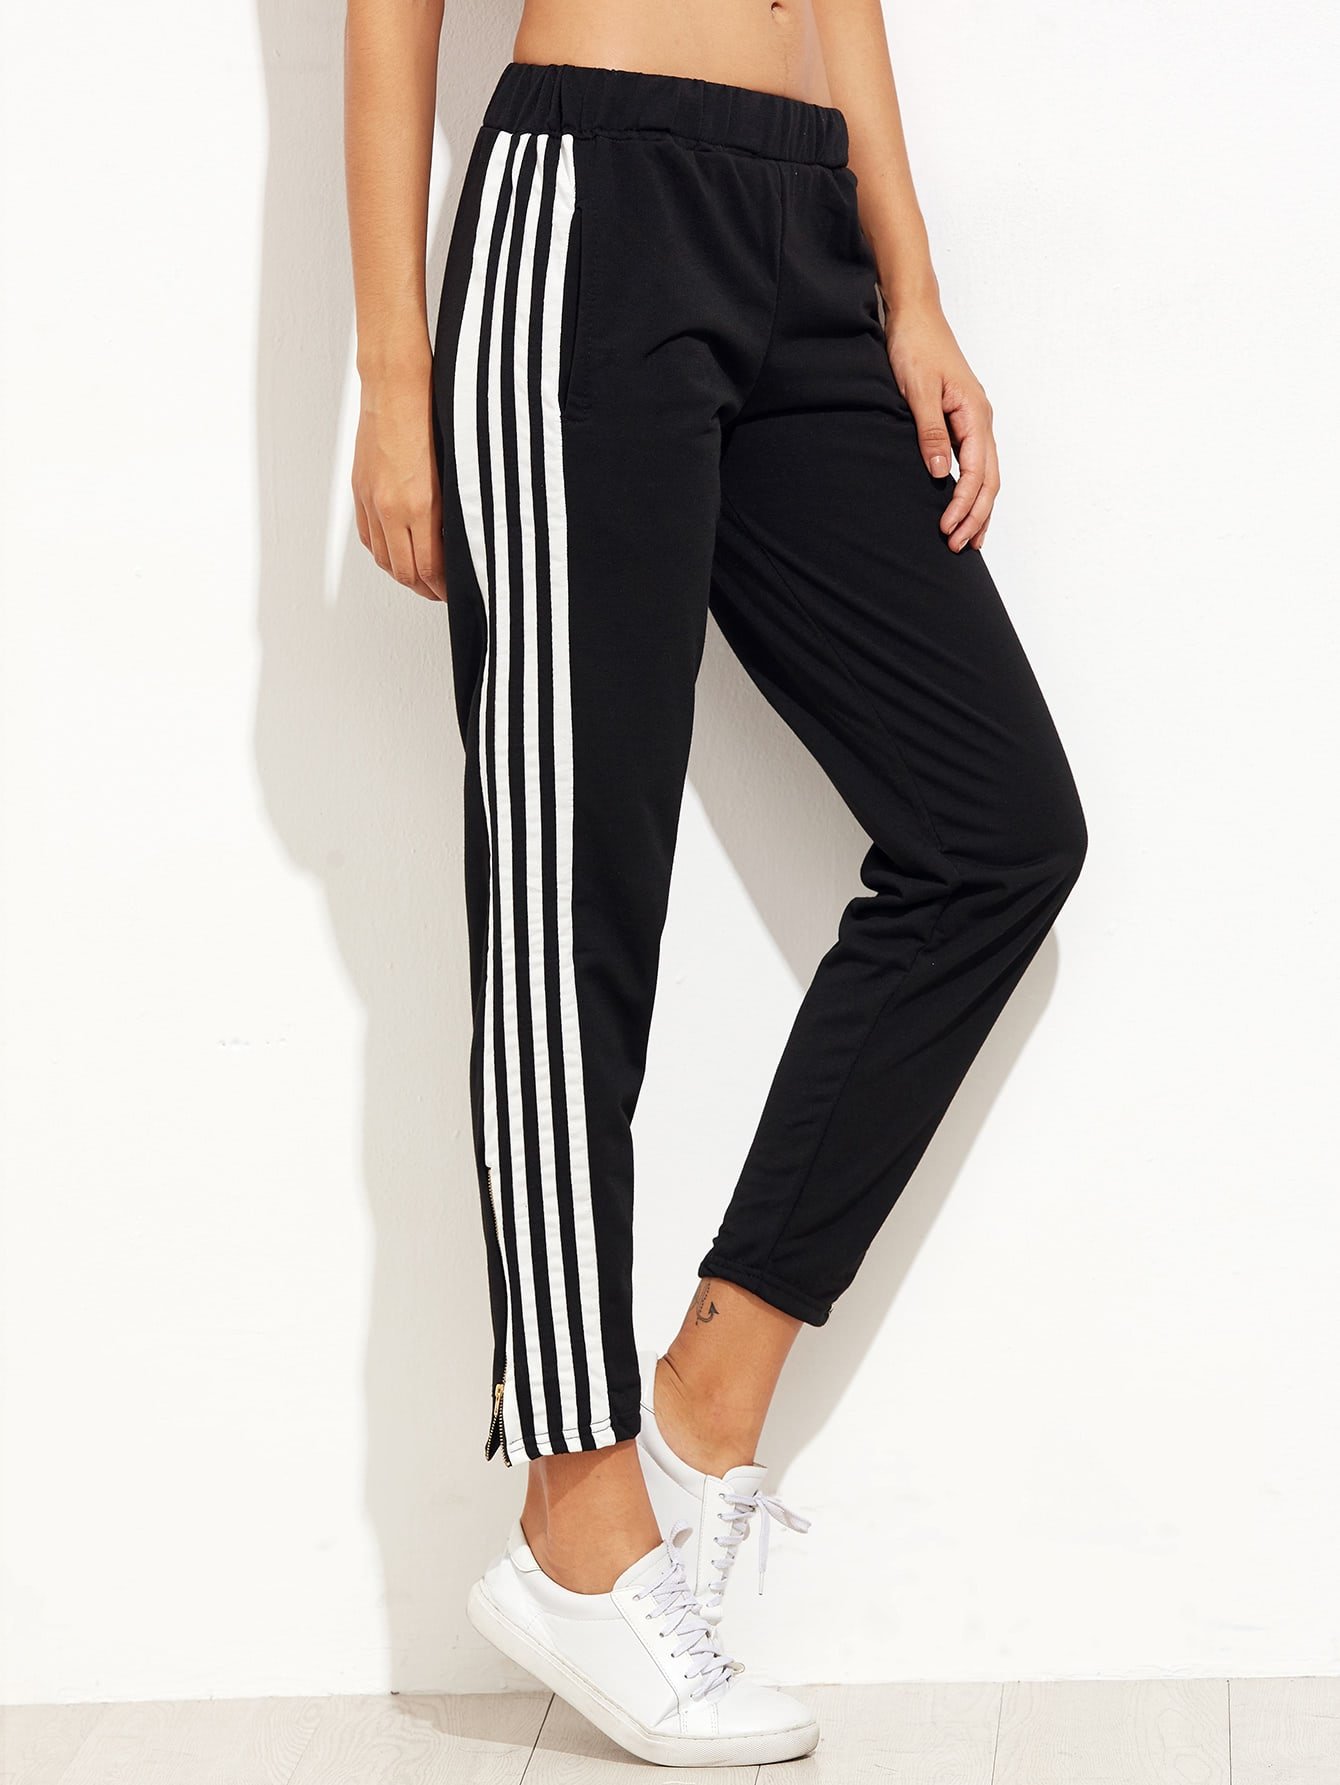 Black Striped Trim Zipper PantsBlack Striped Trim Zipper Pants<br><br>color: Black<br>size: L,M,S